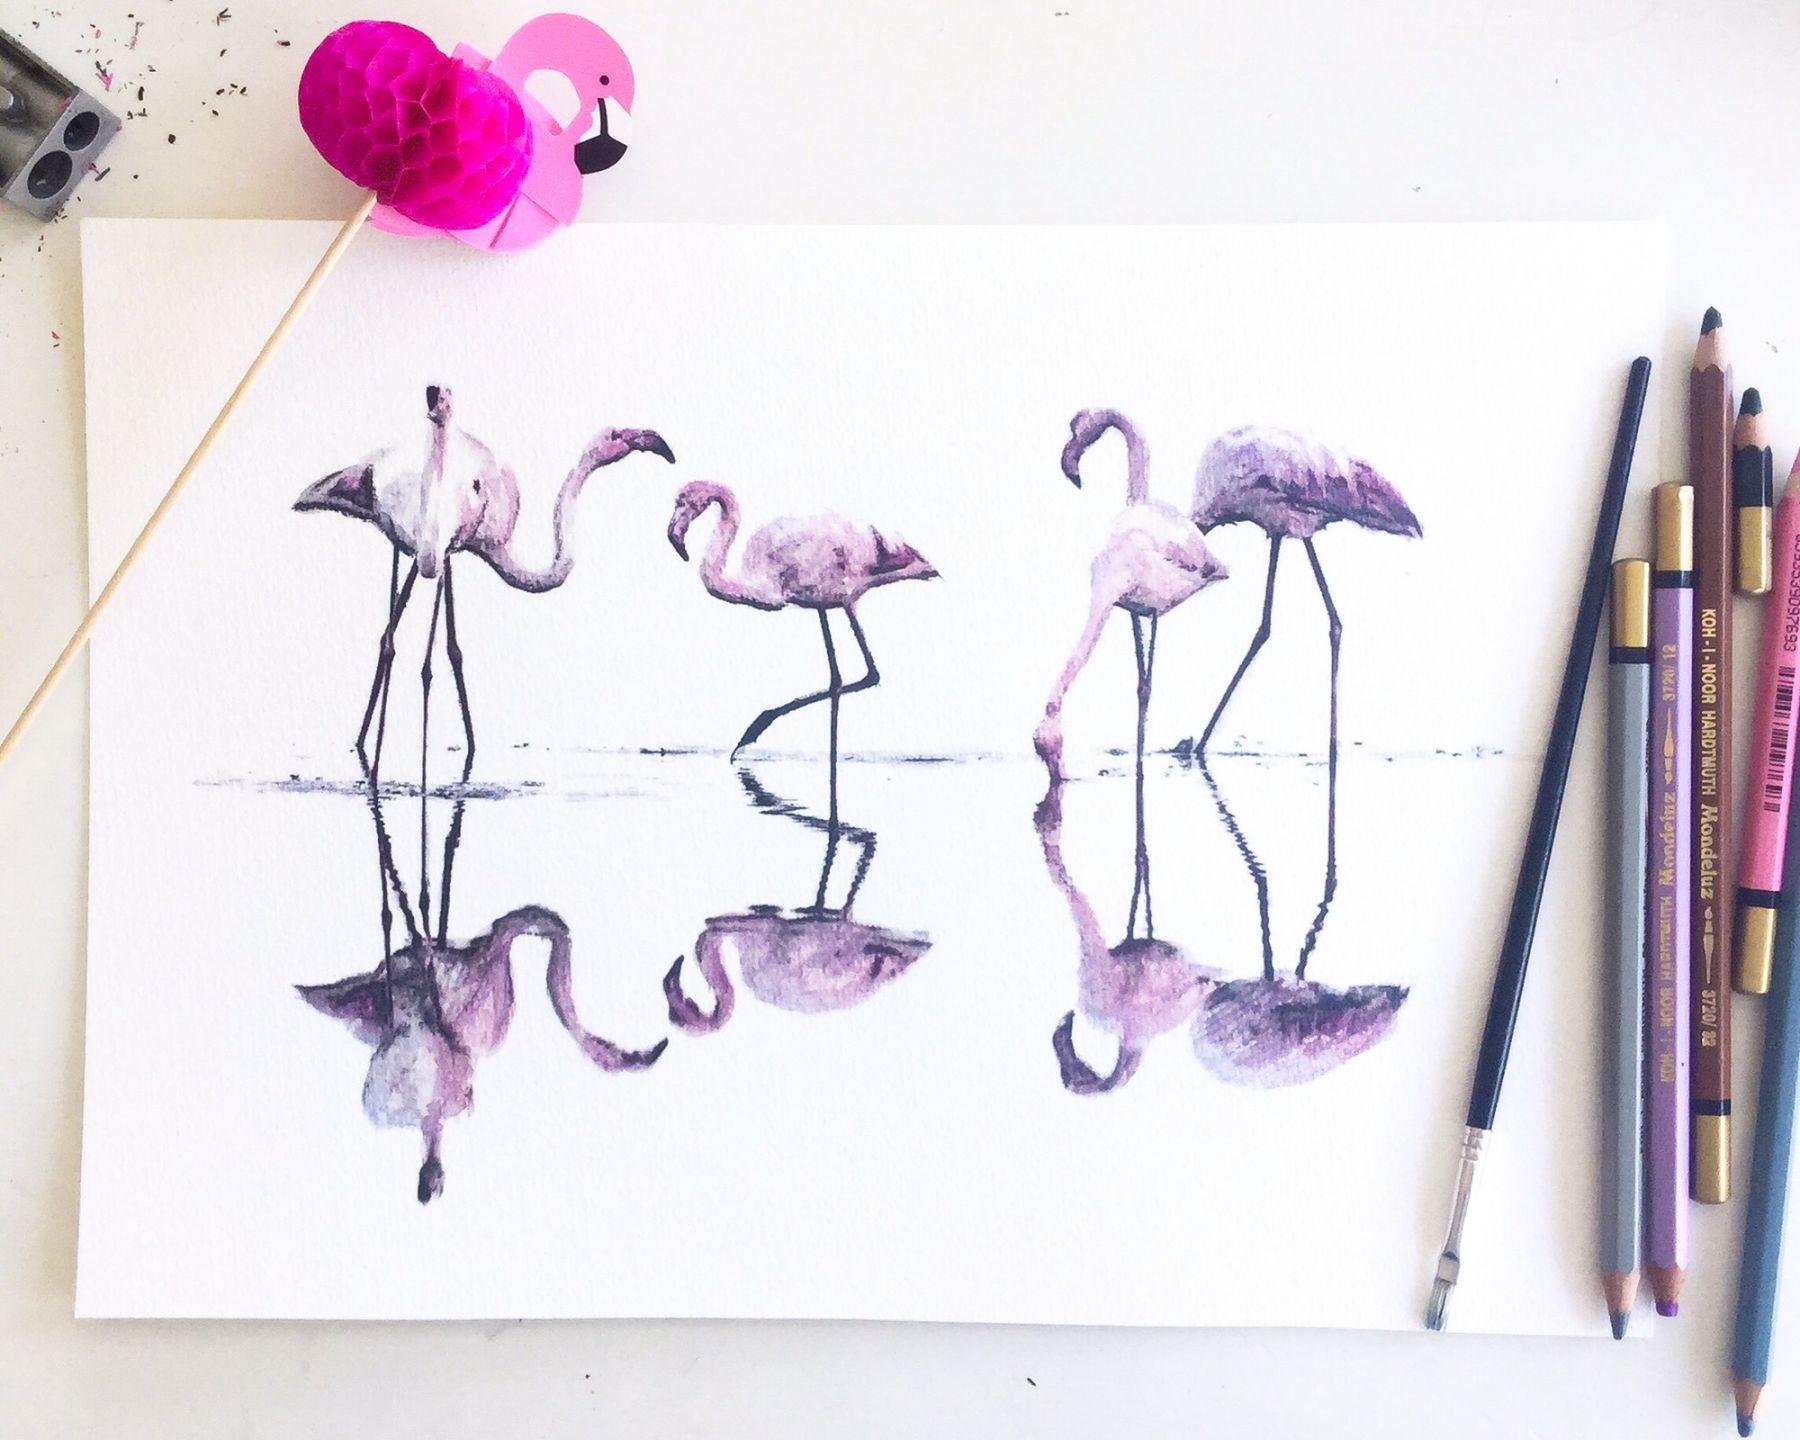 Signerat print, Flamingos 375 kr, Leonor Juhl K